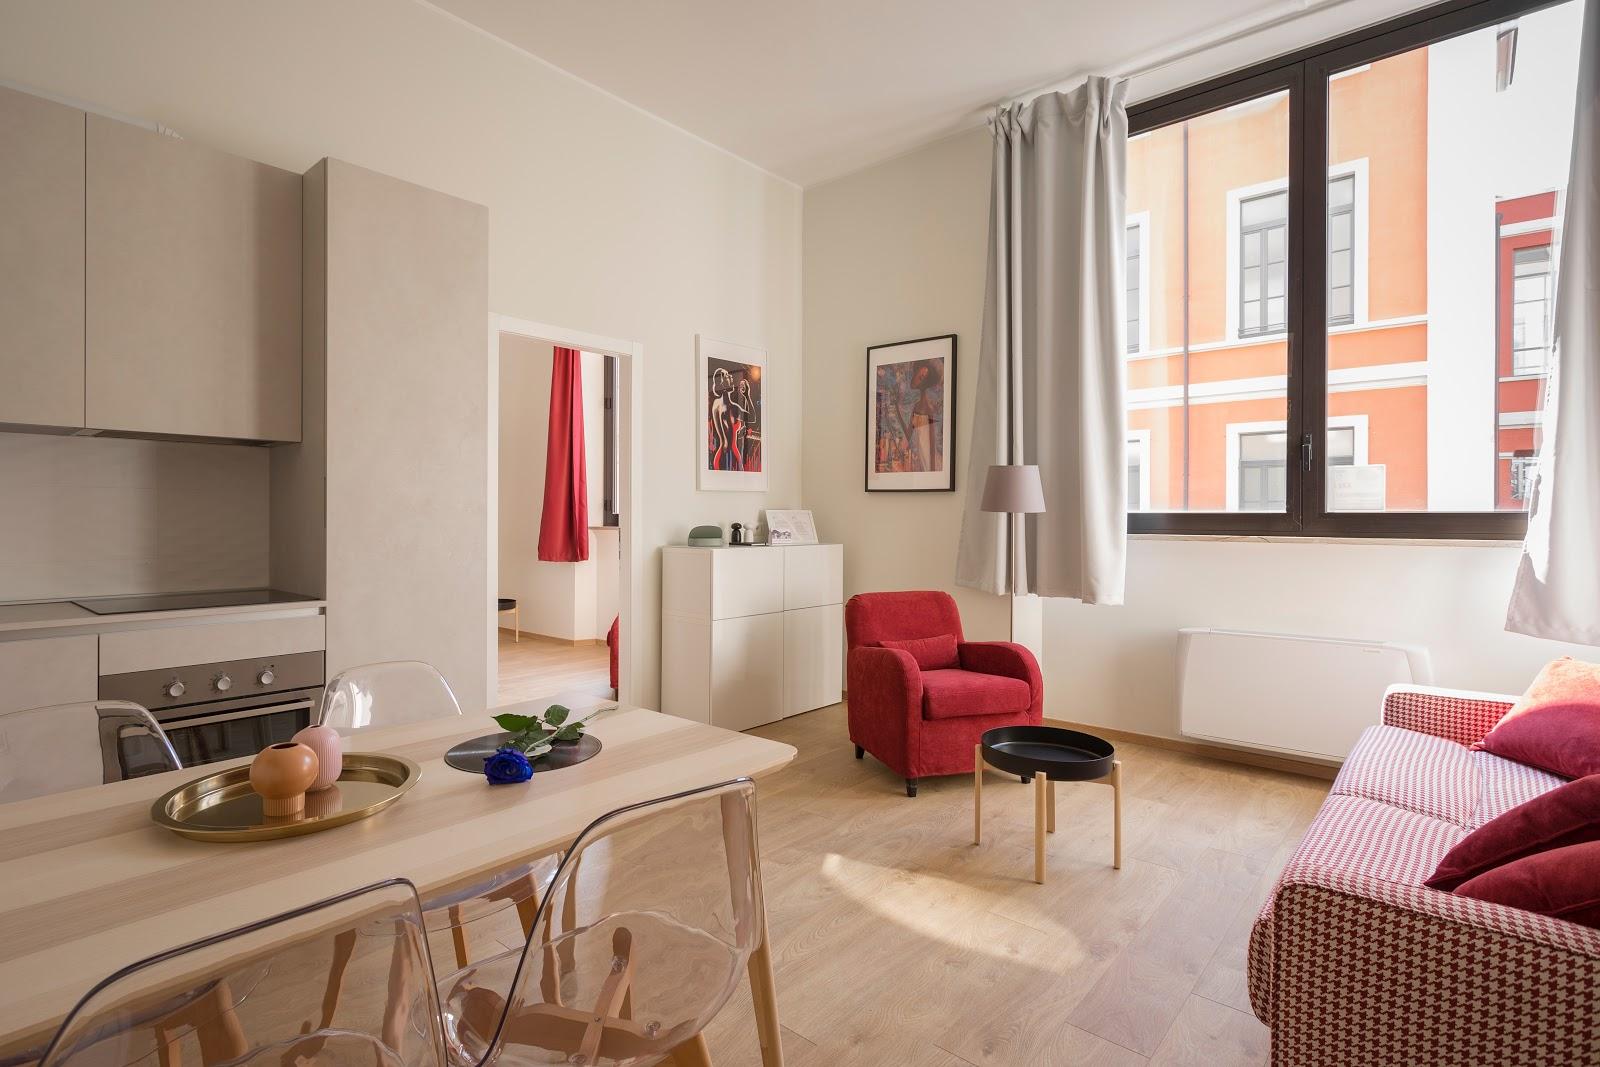 furnished travel nurse lodging